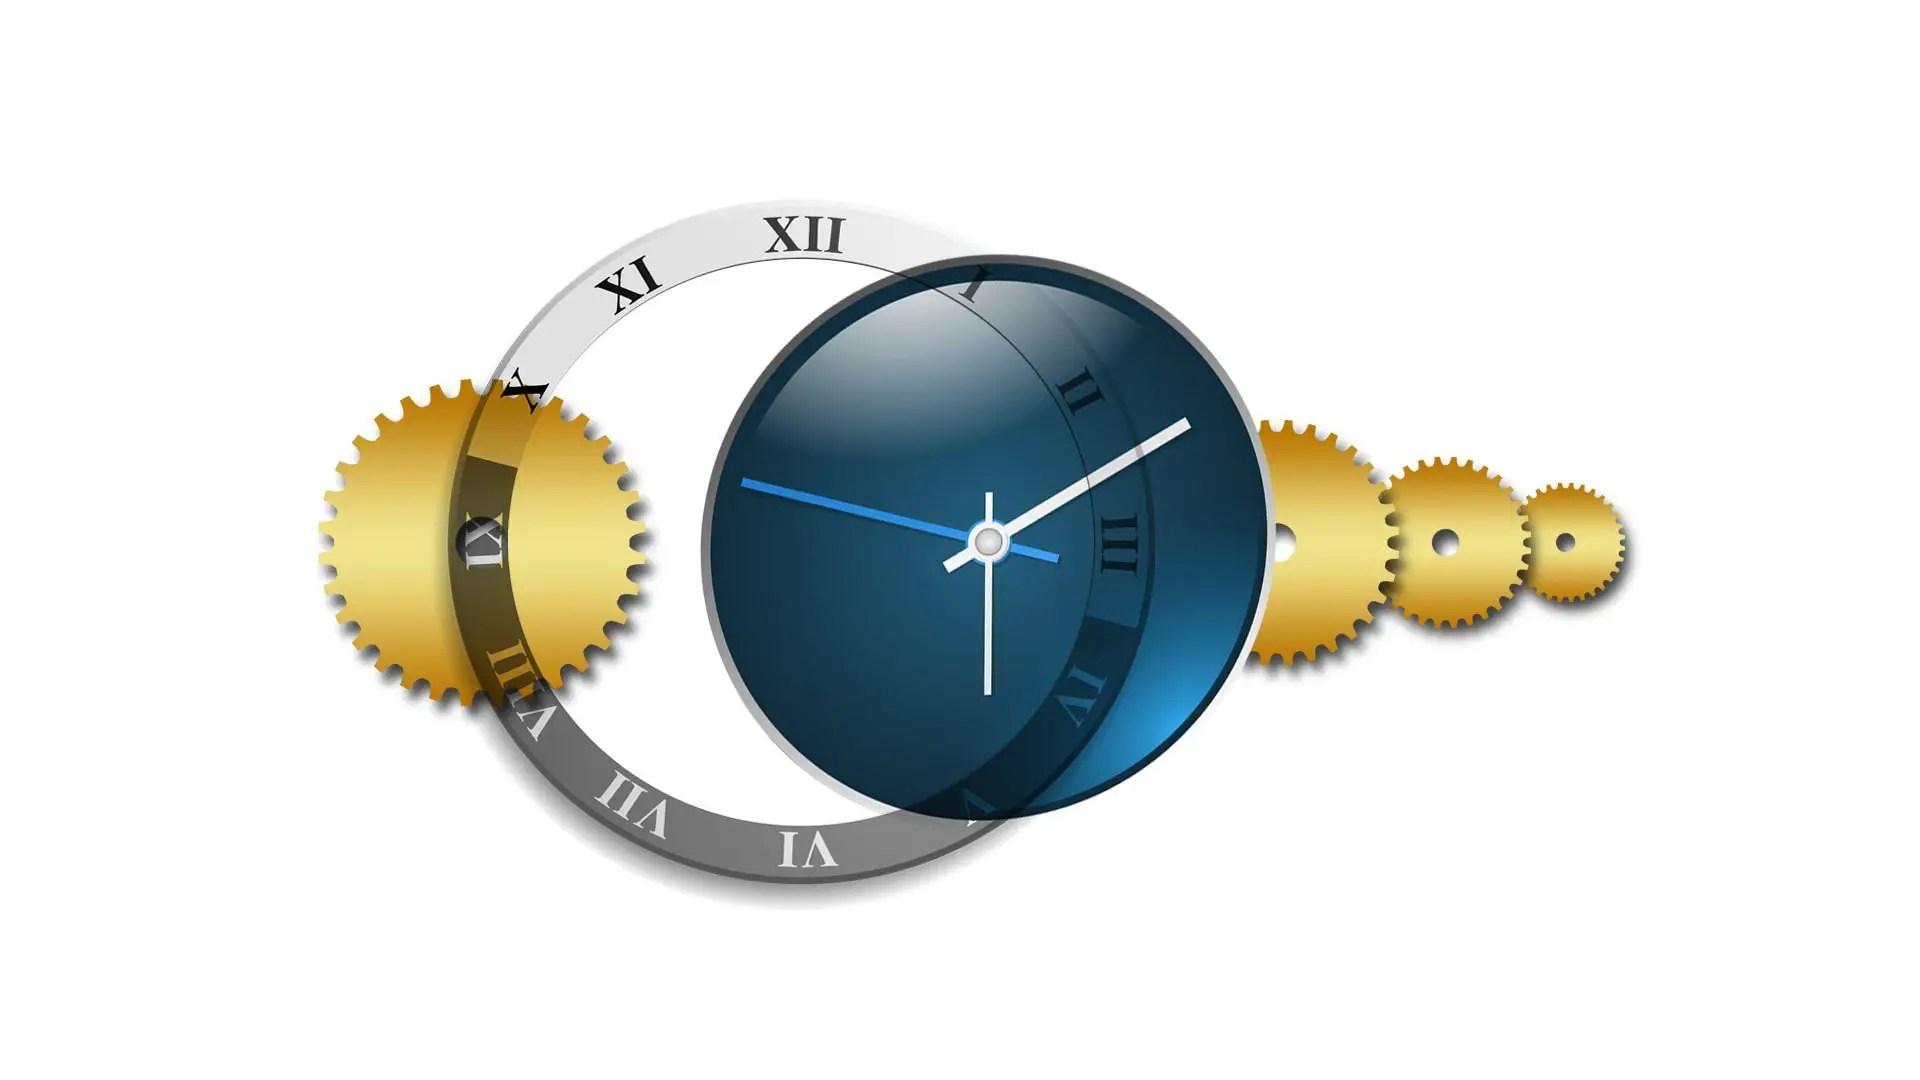 Wie funktioniert der Tefal NUTRICOOK-Timer?